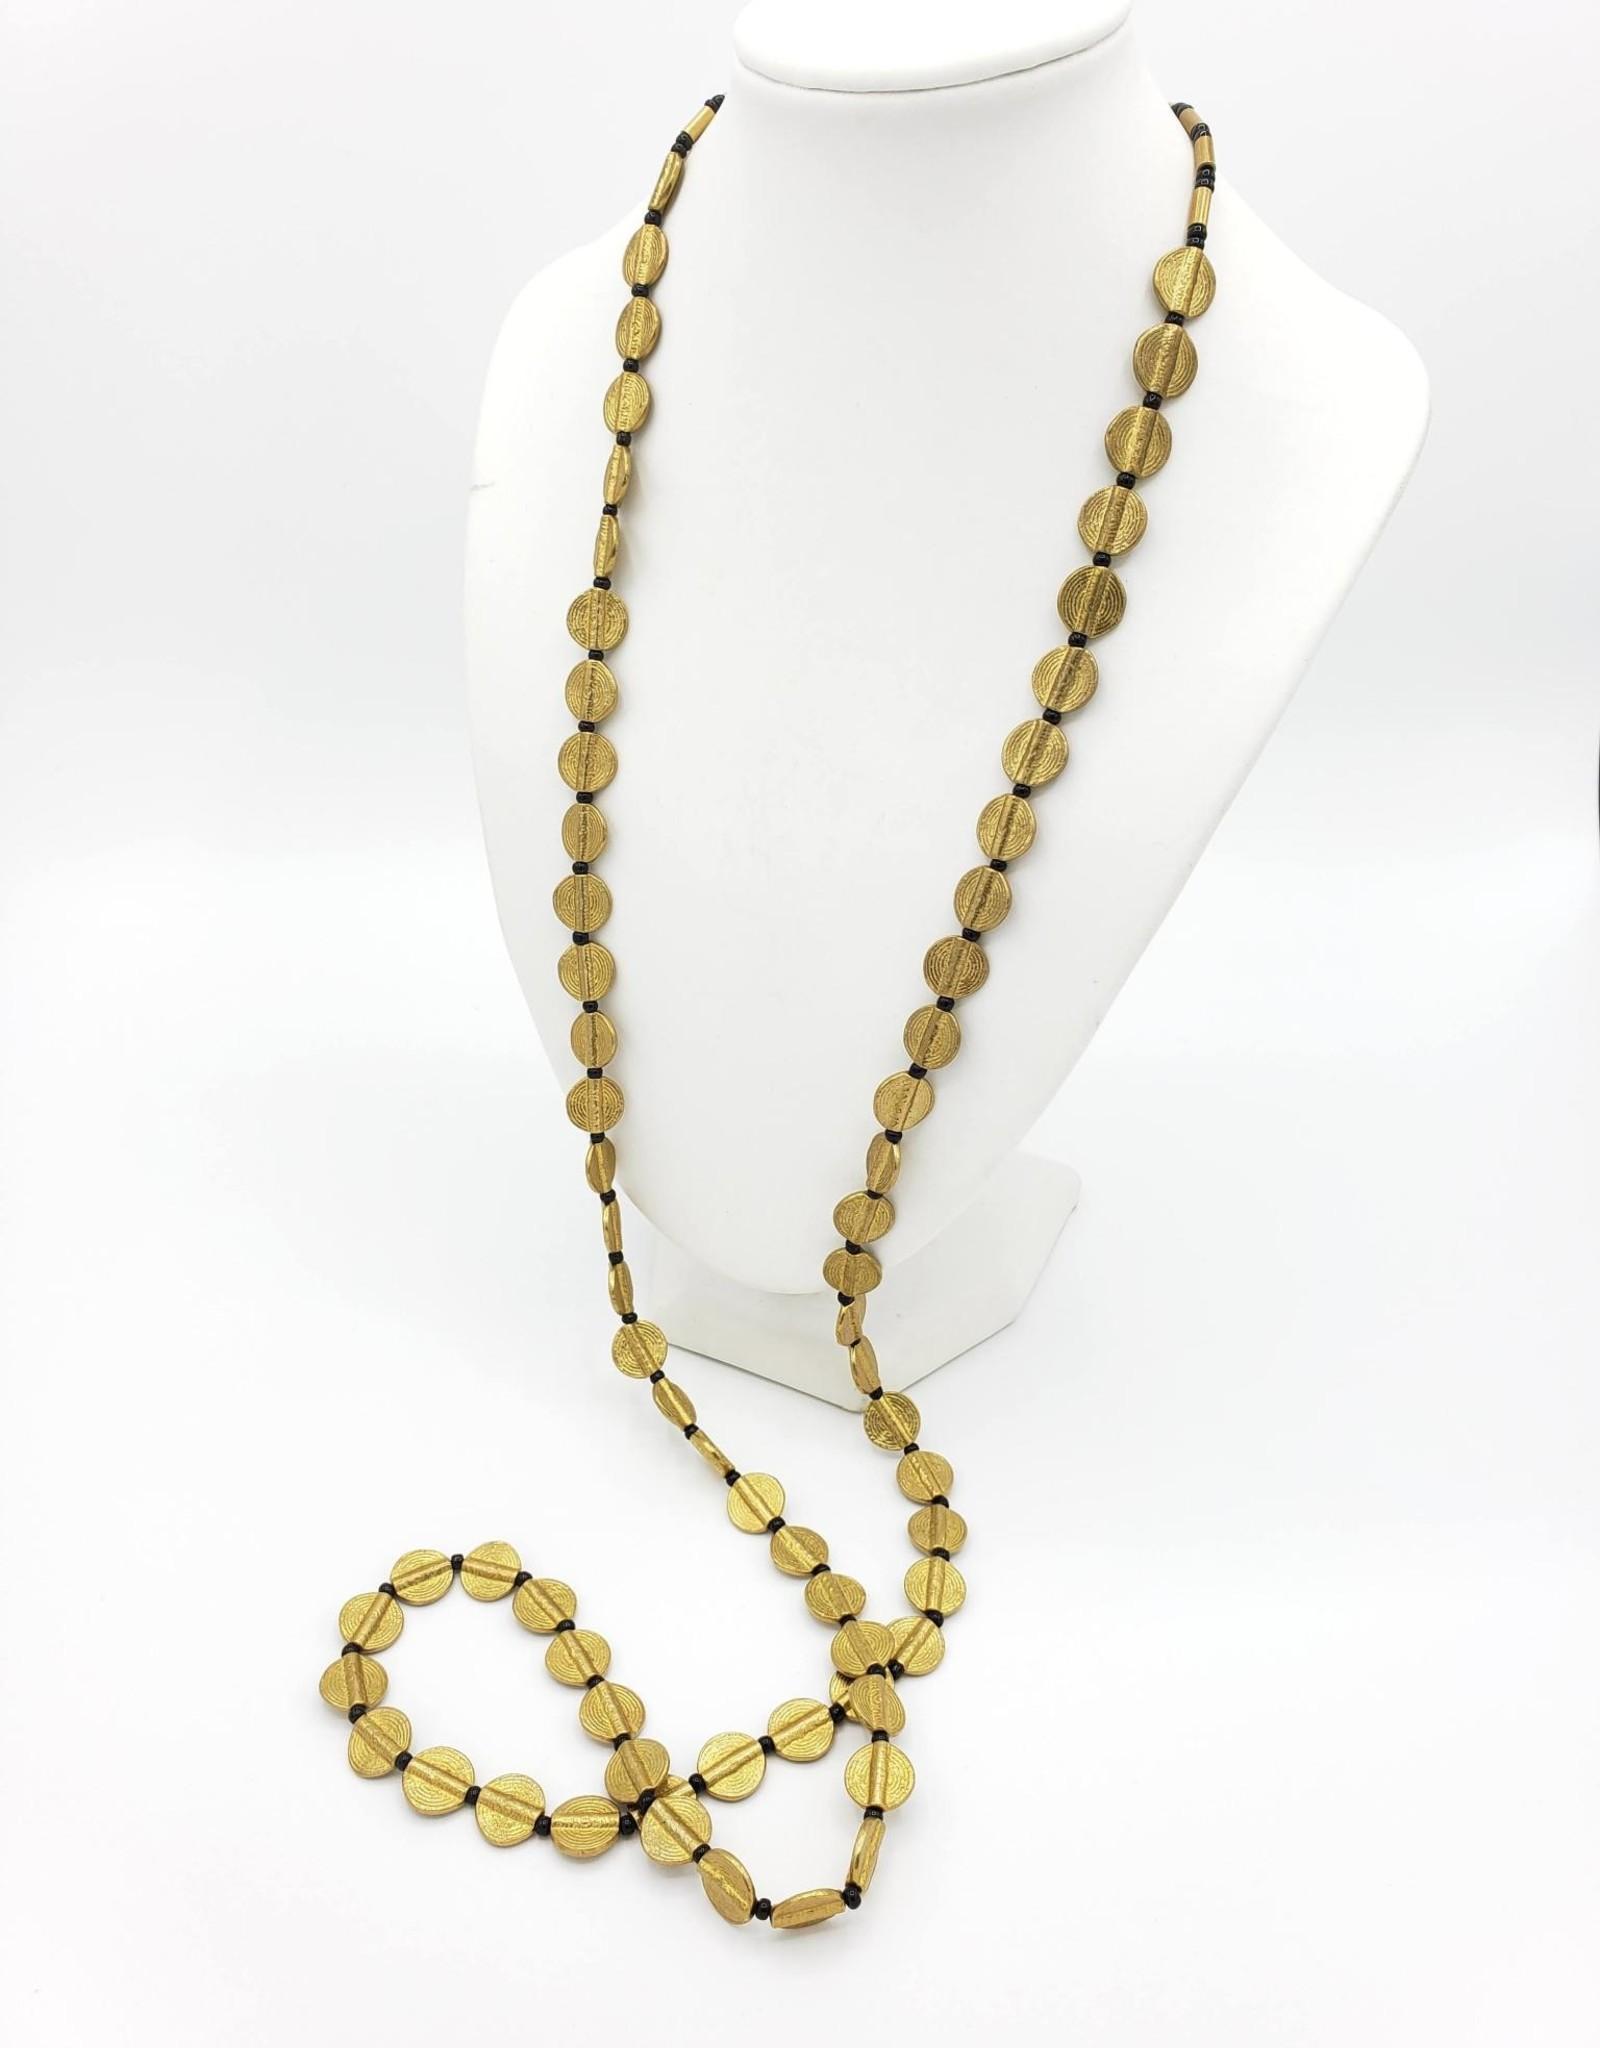 Boho Gal Jewelry Sana Necklace with Brass Flat Circle Beads